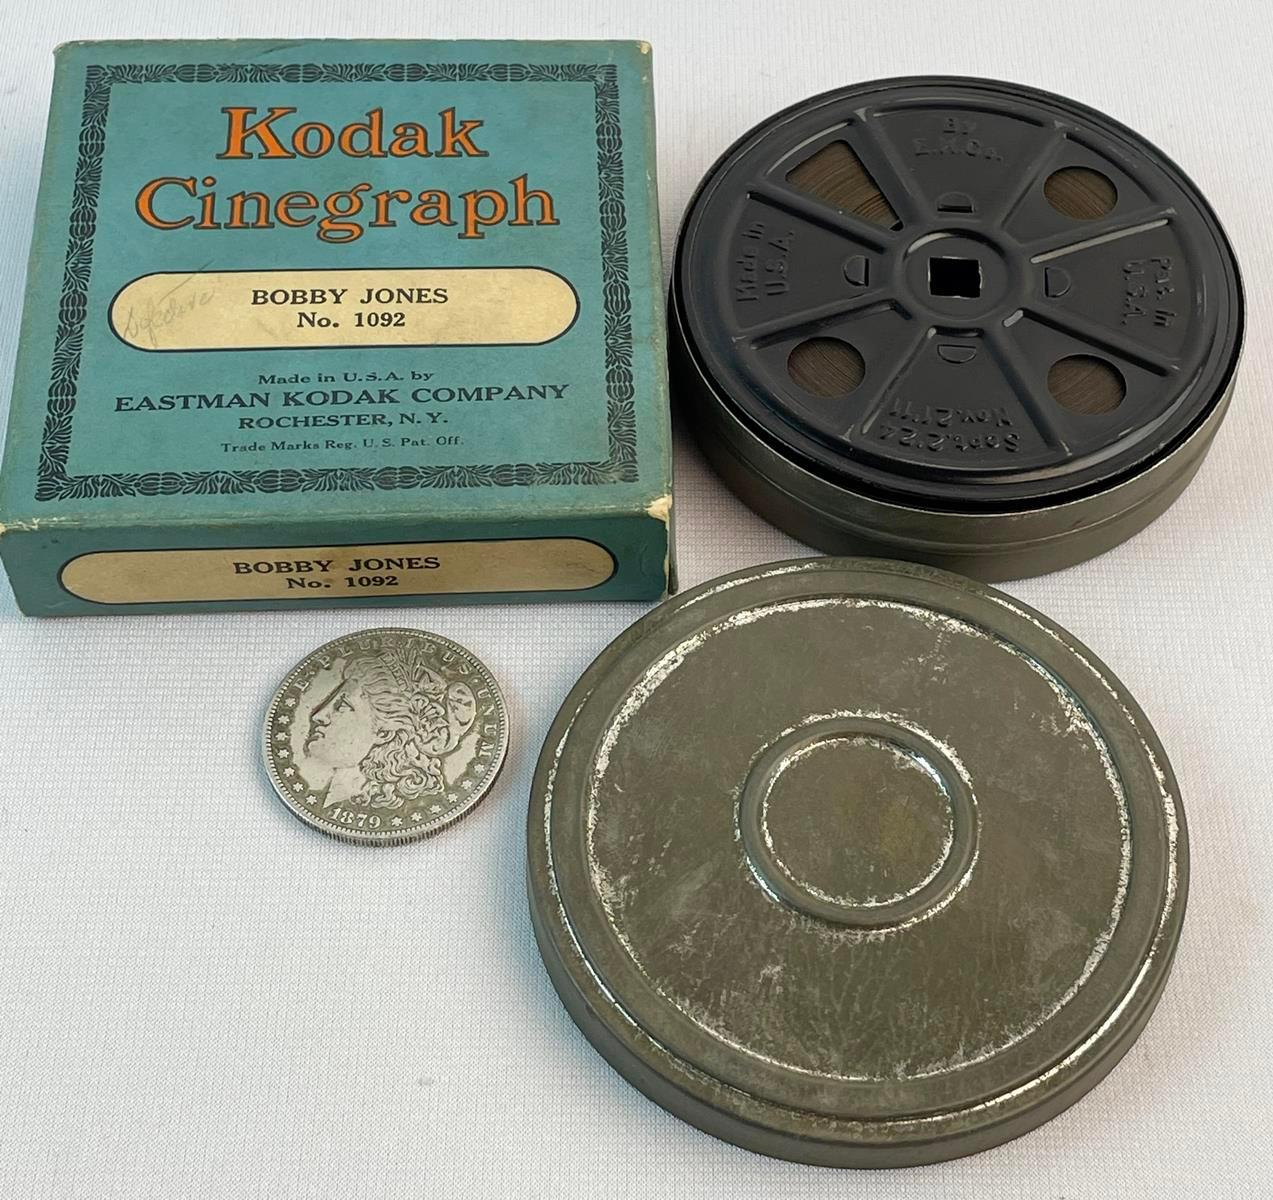 Vintage 1920's Golf Legend Bobby Jones 16MM Kodak Cinegraph Film No. 1092 w/ Original Box